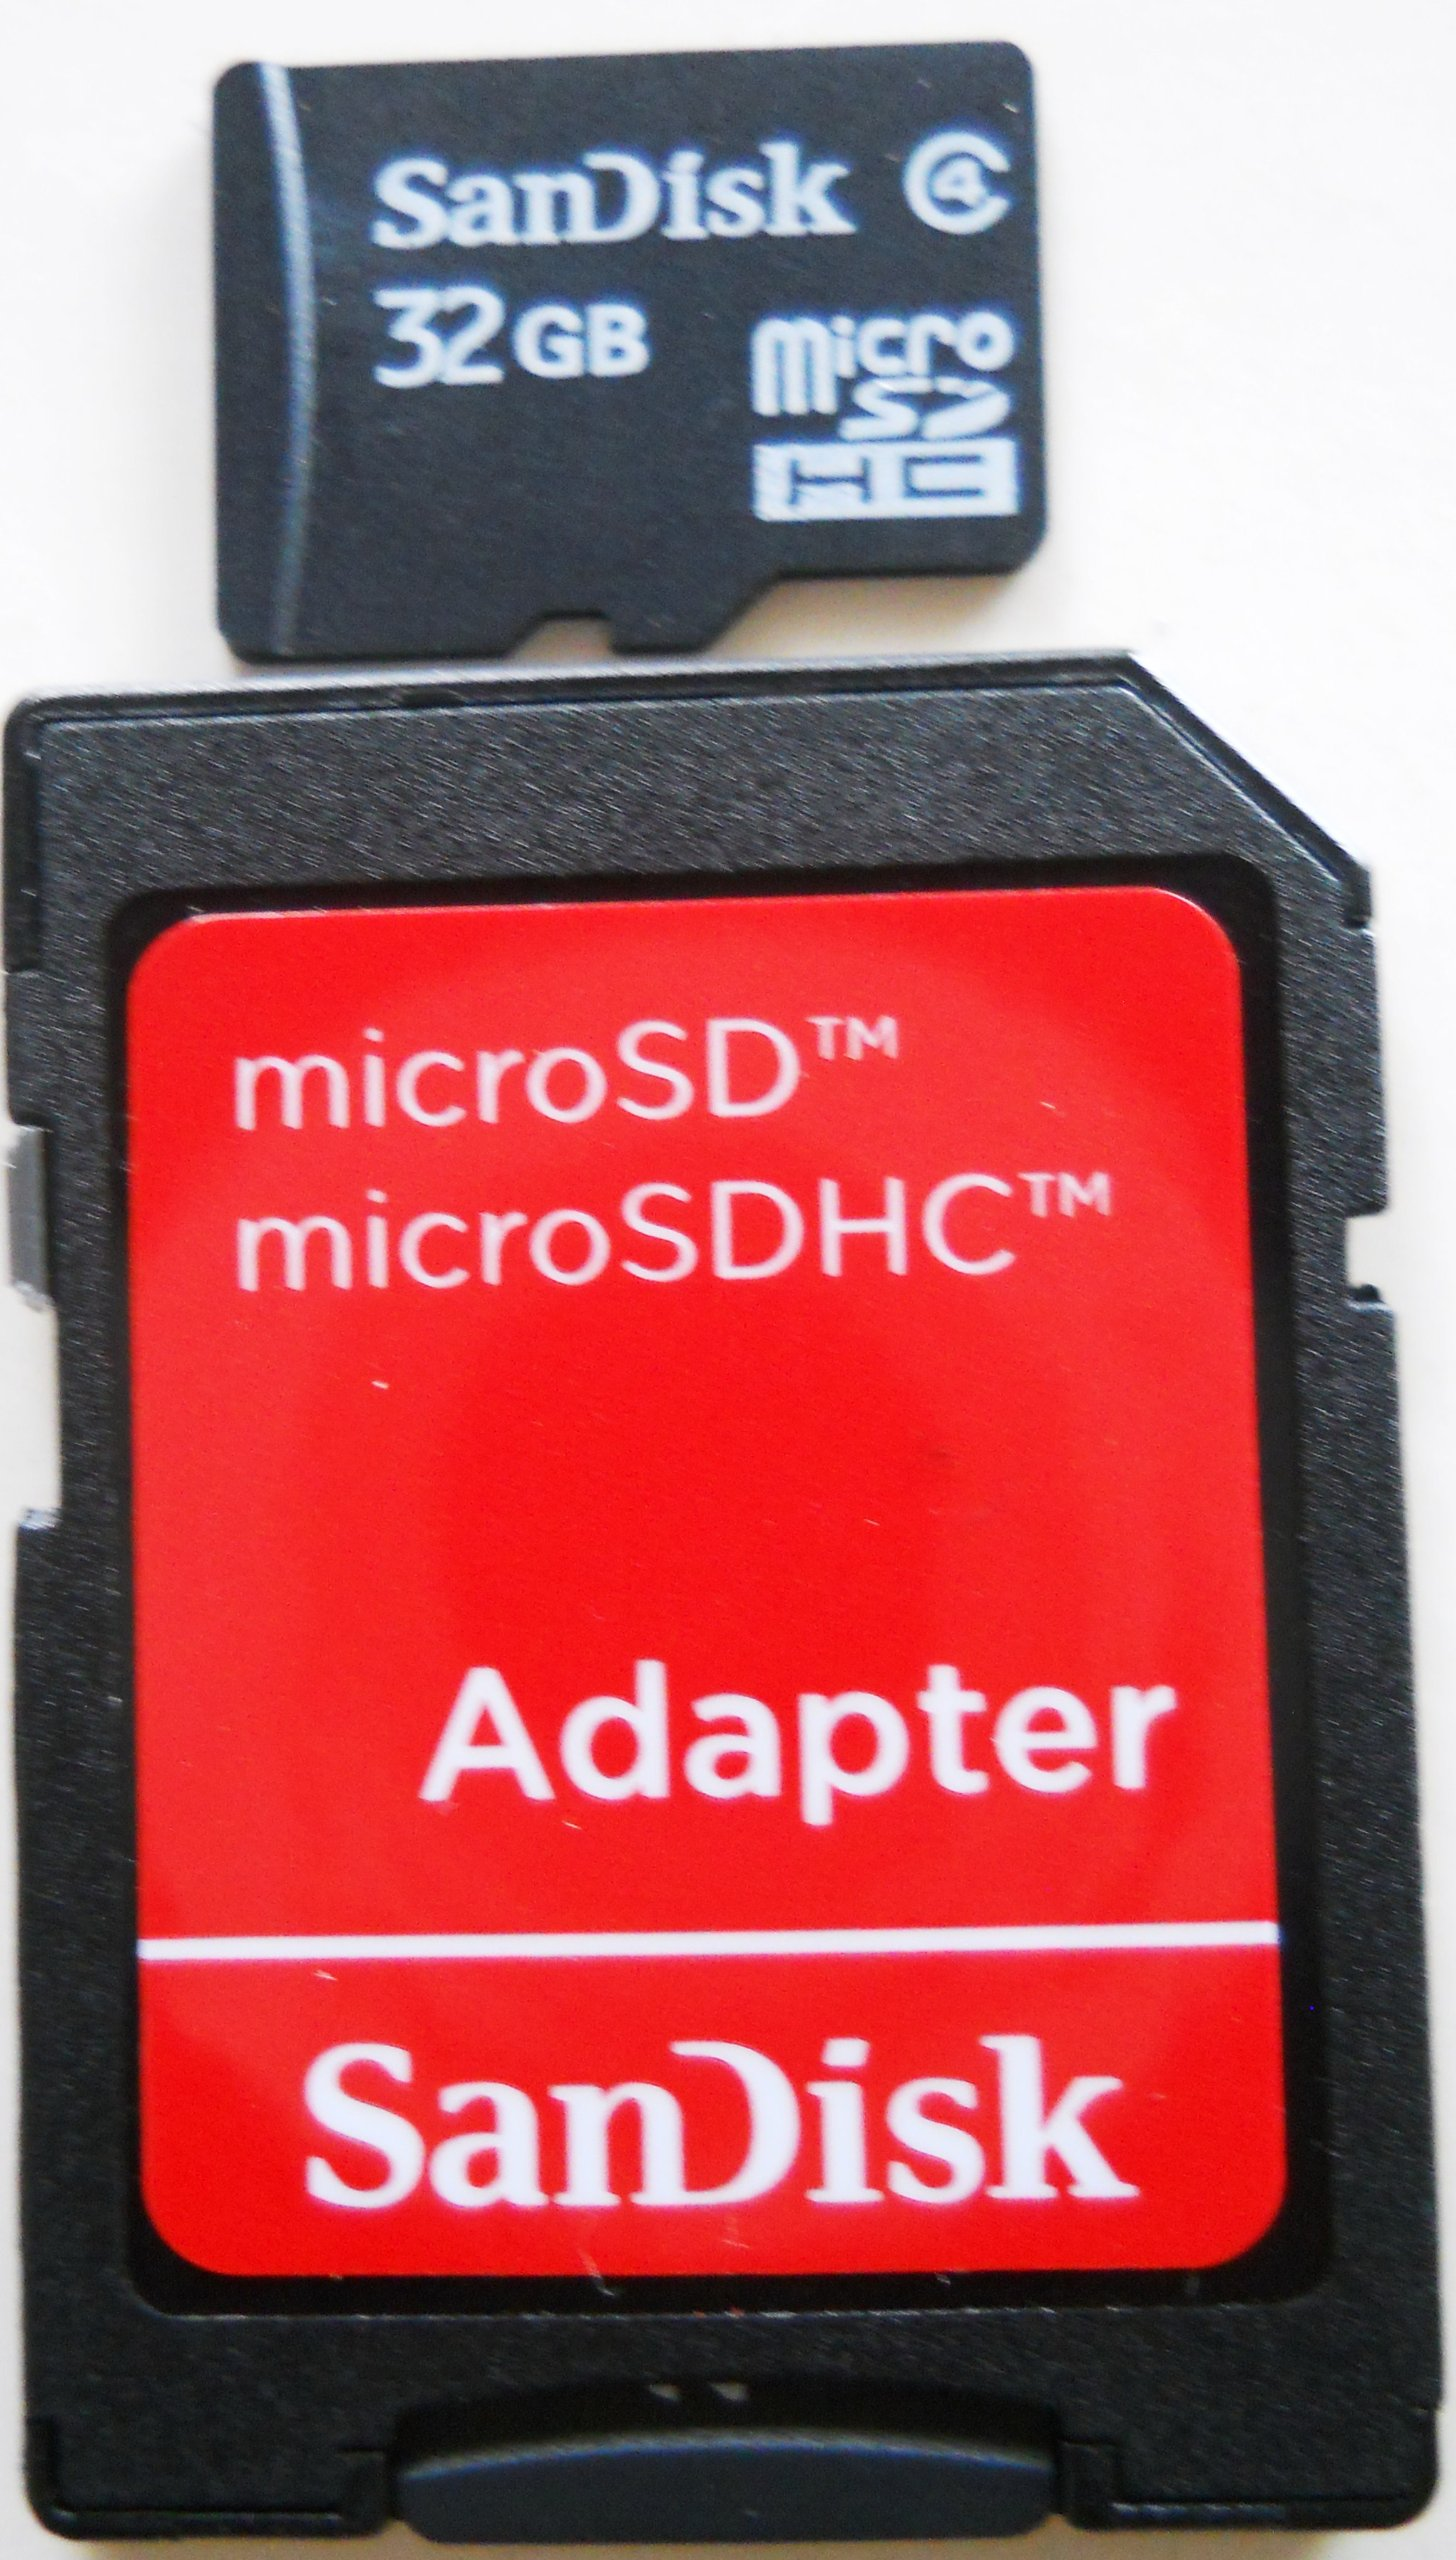 SanDisk 32GB microSDHC Card w/ SD & miniSD Adapter (SDSDQ-032G-2ADP)